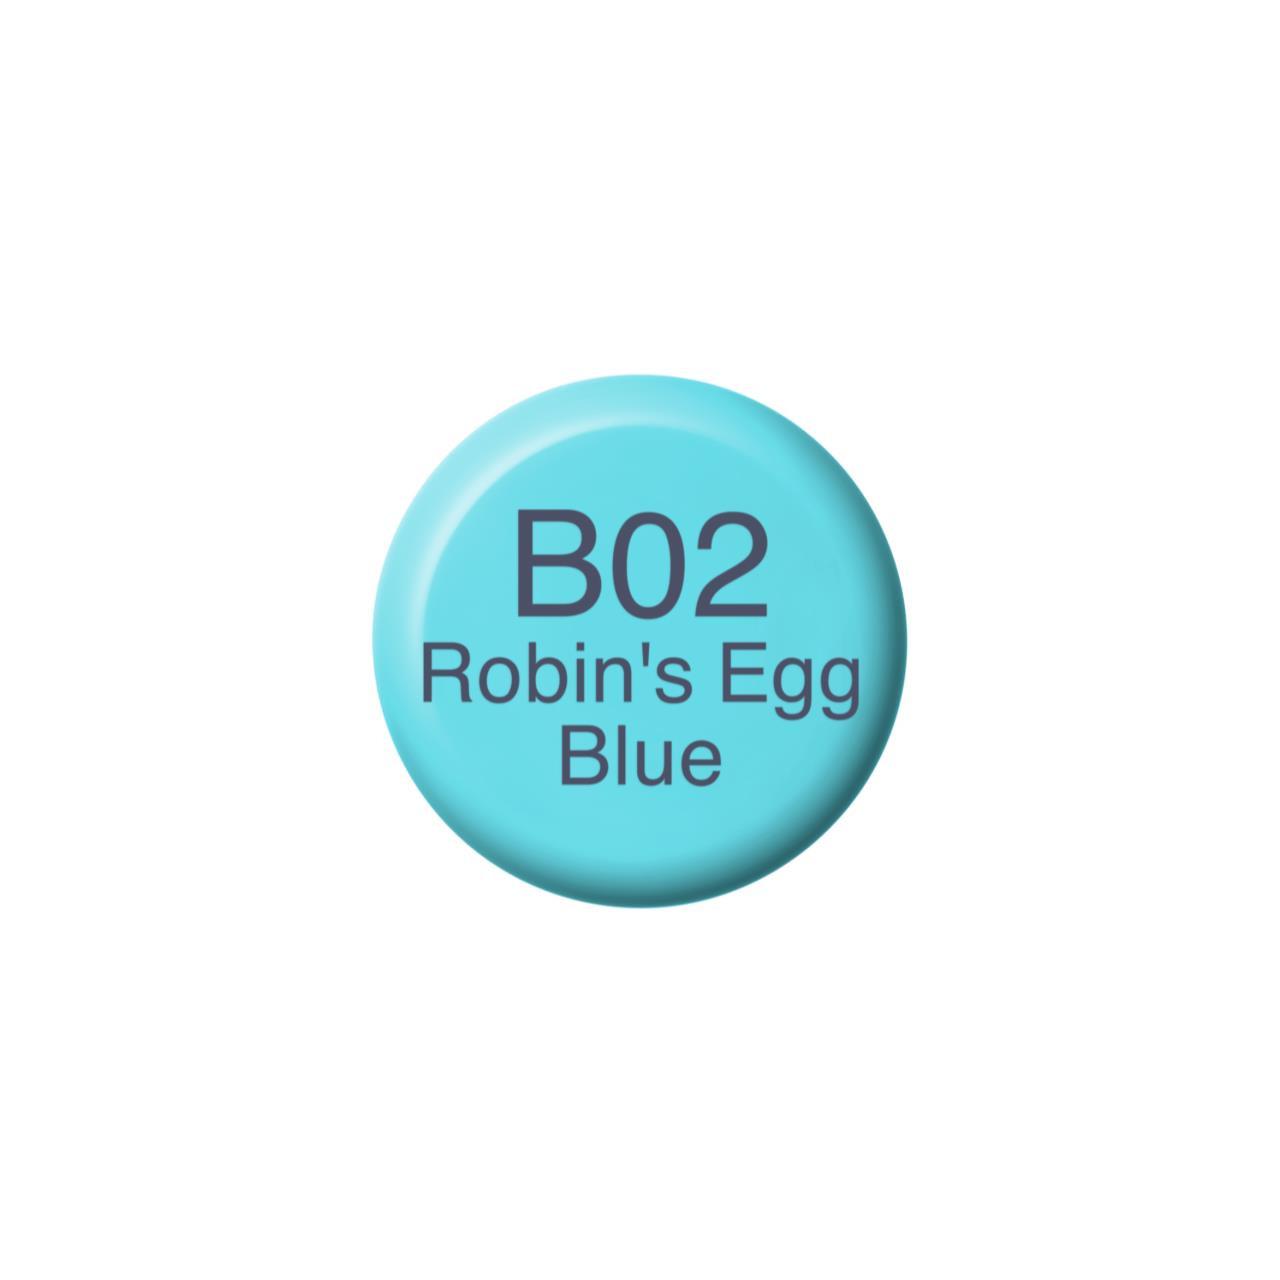 B02 Robin's Egg Blue, Copic Ink - 4511338055847